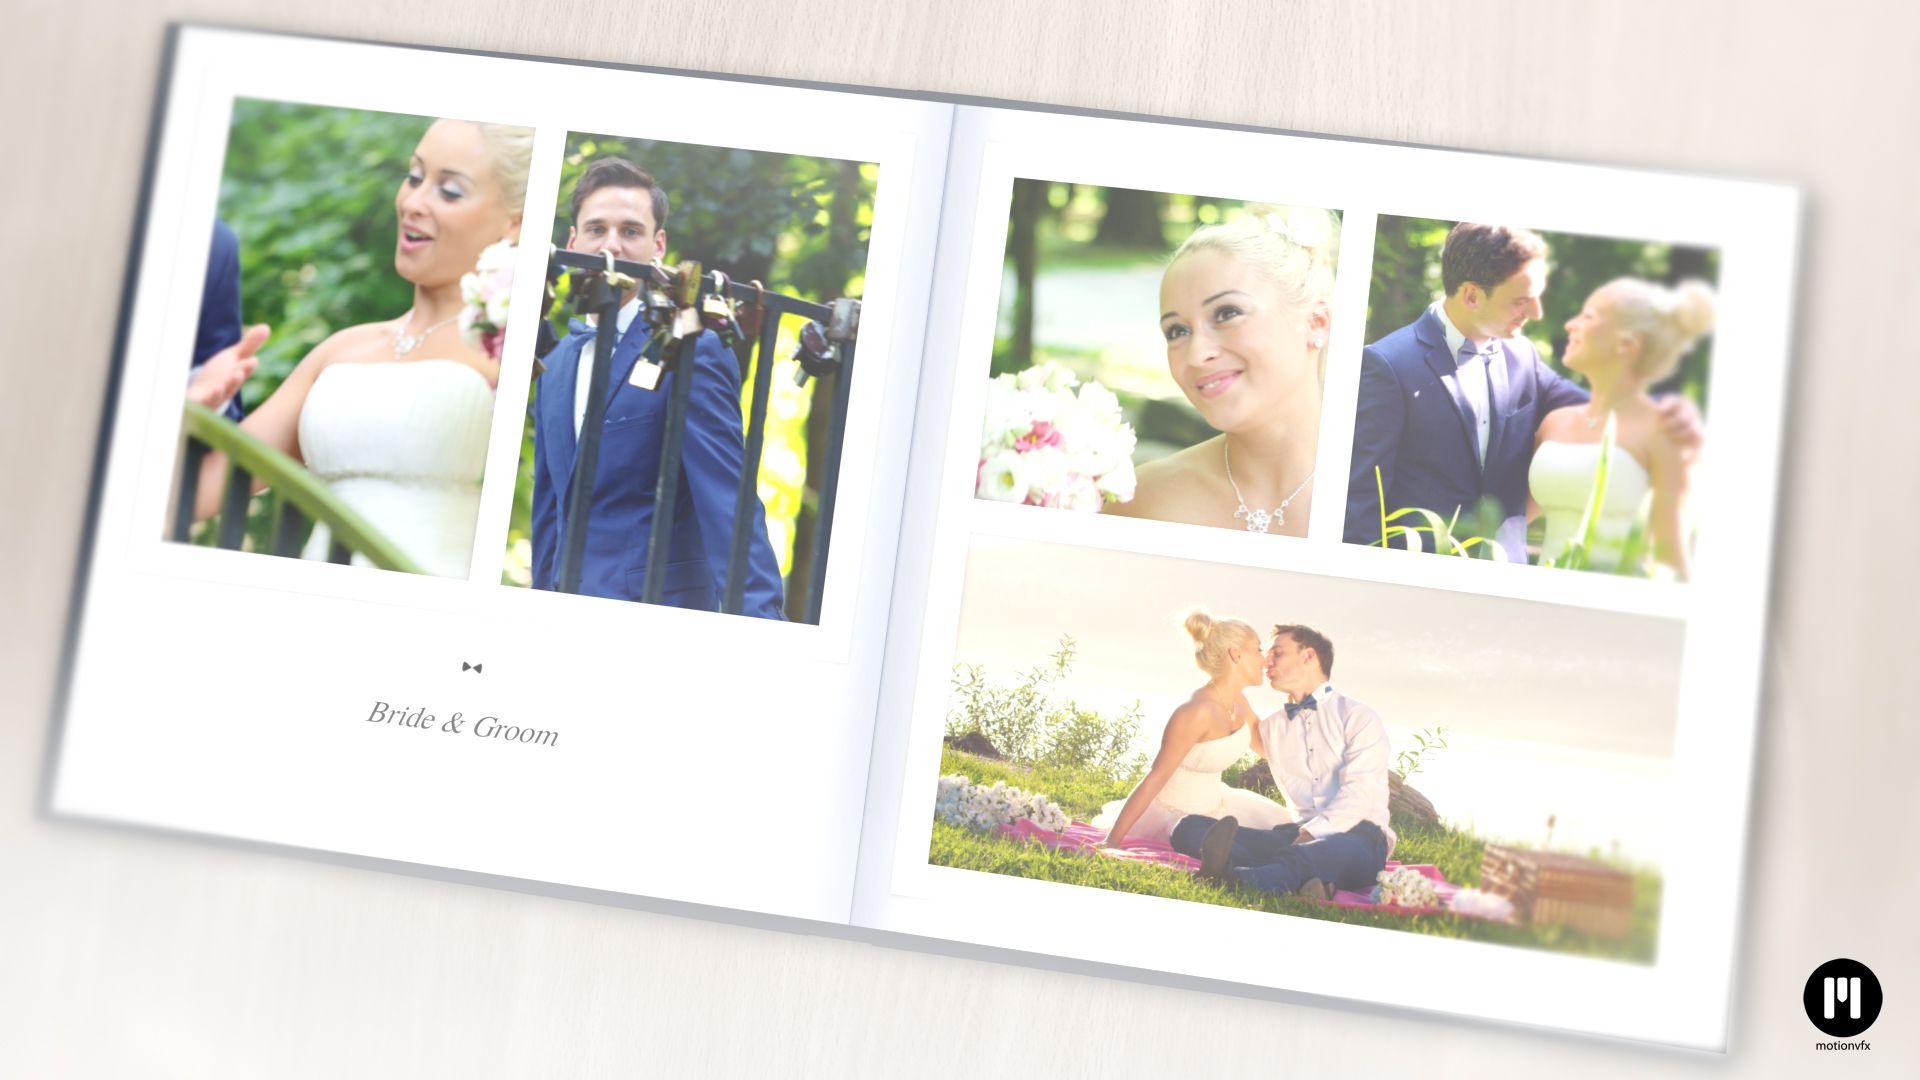 Wedding Album Motion 5 Template Arrived Https Www Motionvfx Com Store Project 1044 P1868 Html Motion5 Wedding Album Templates Wedding Album Wedding Videos